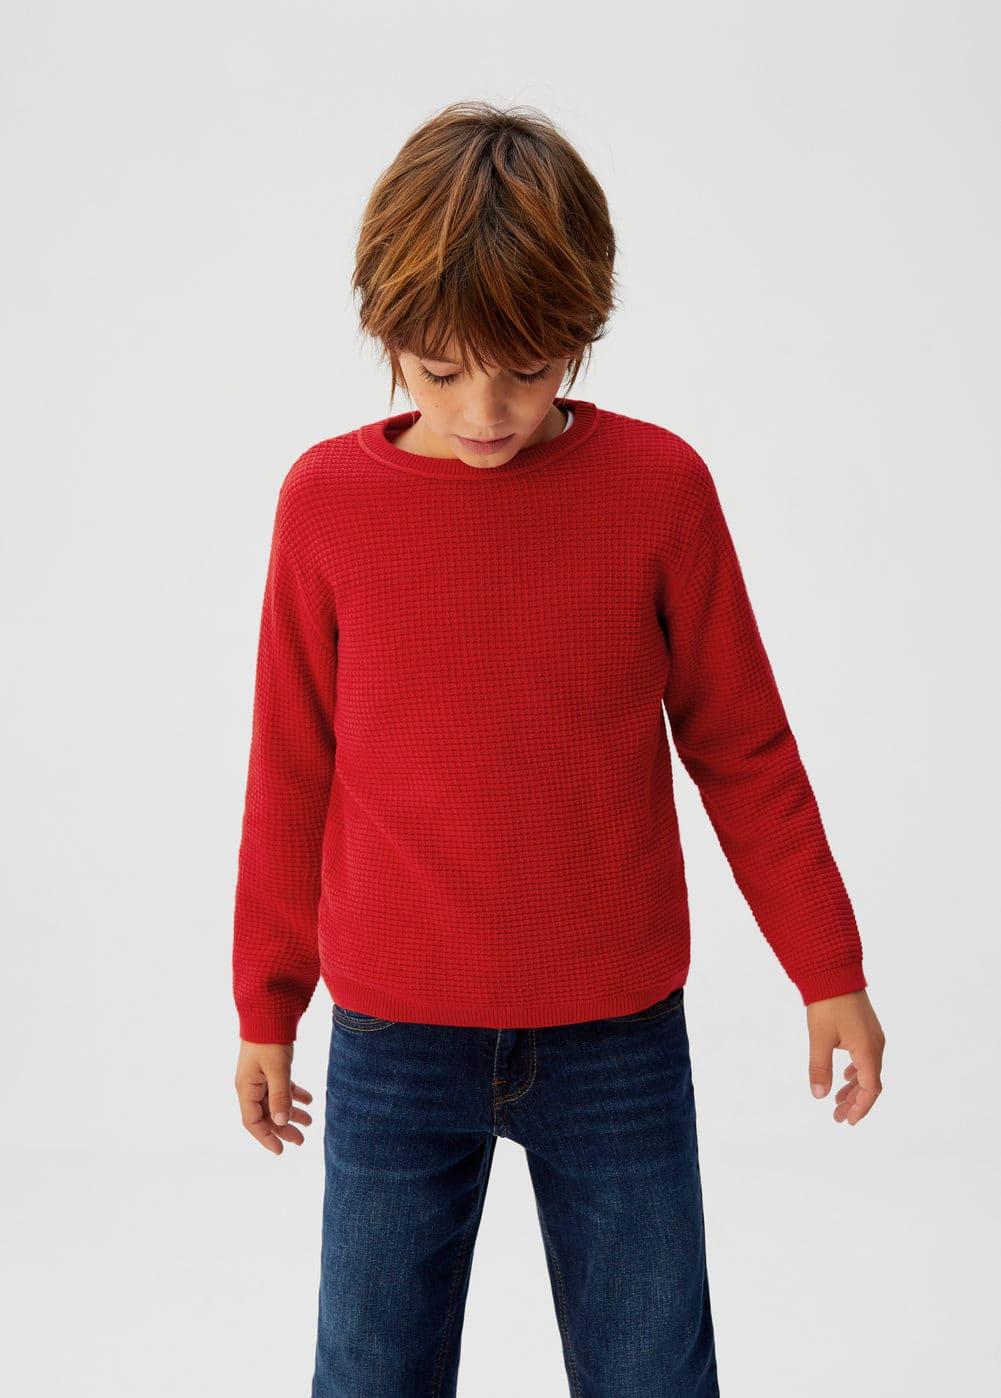 o-viti6:jersey punto algodon organico